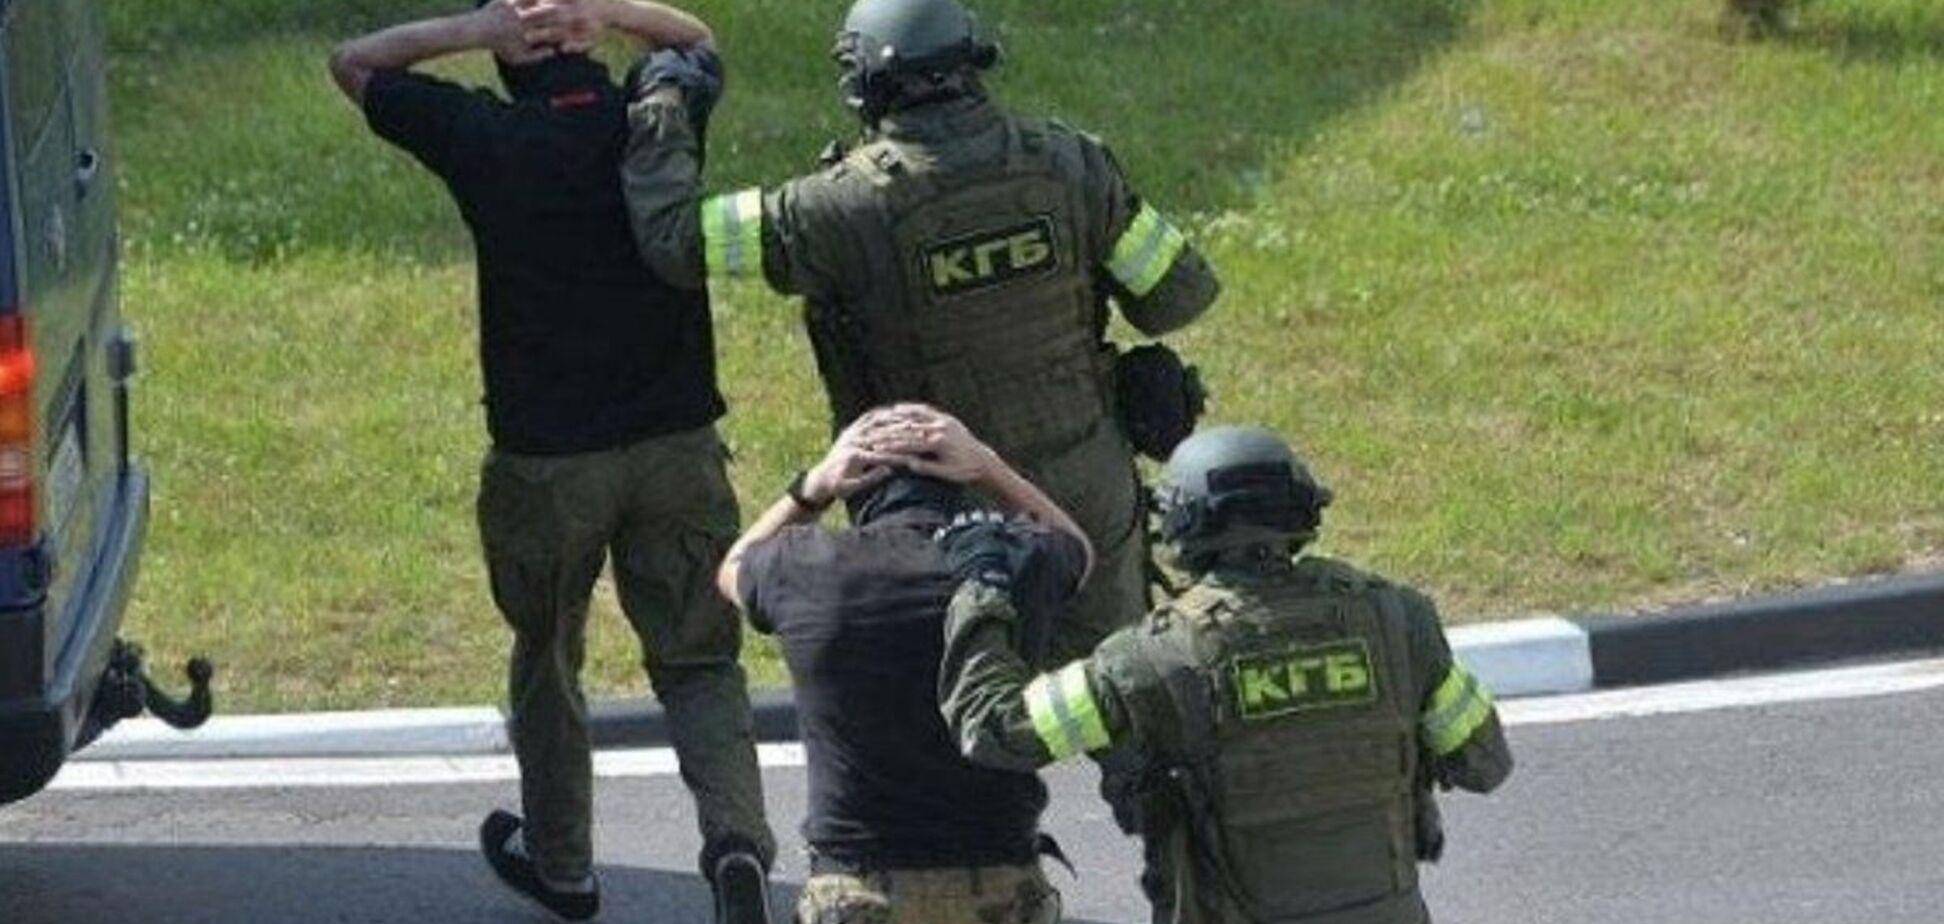 Думала, спецслужбы Беларуси и России за одно, но не все так однозначно